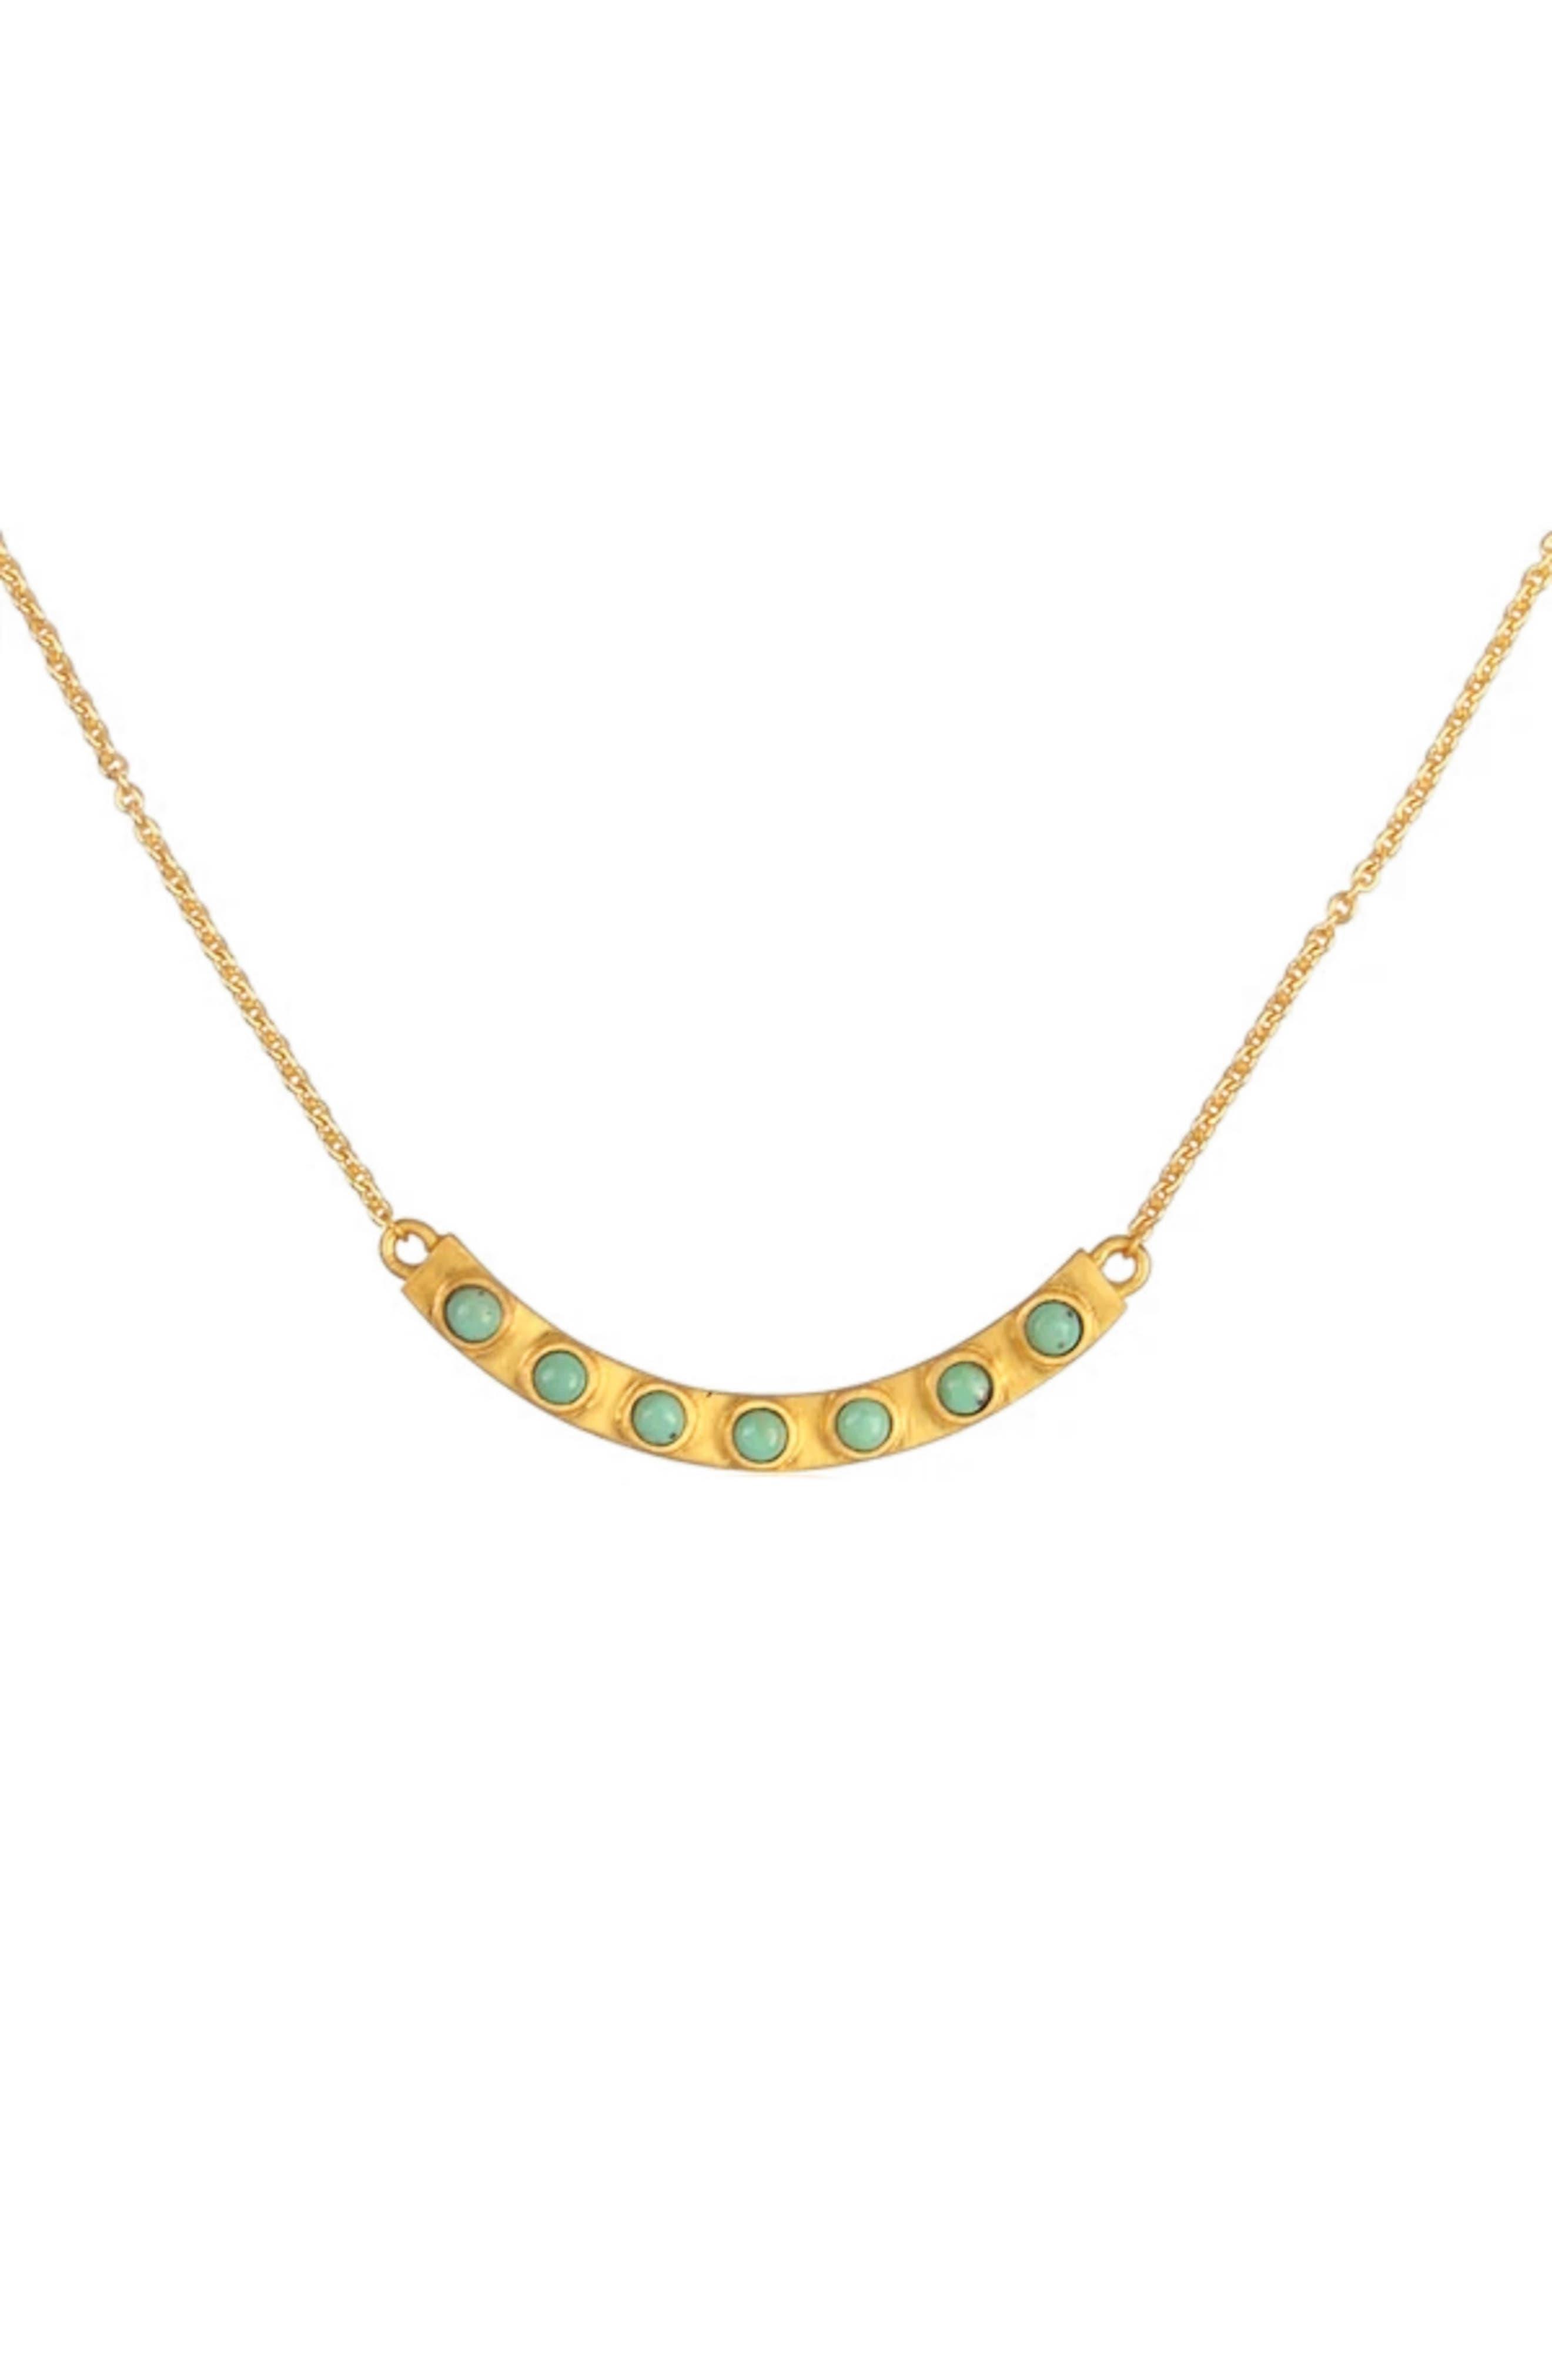 Turquoise Bar Pendant Necklace